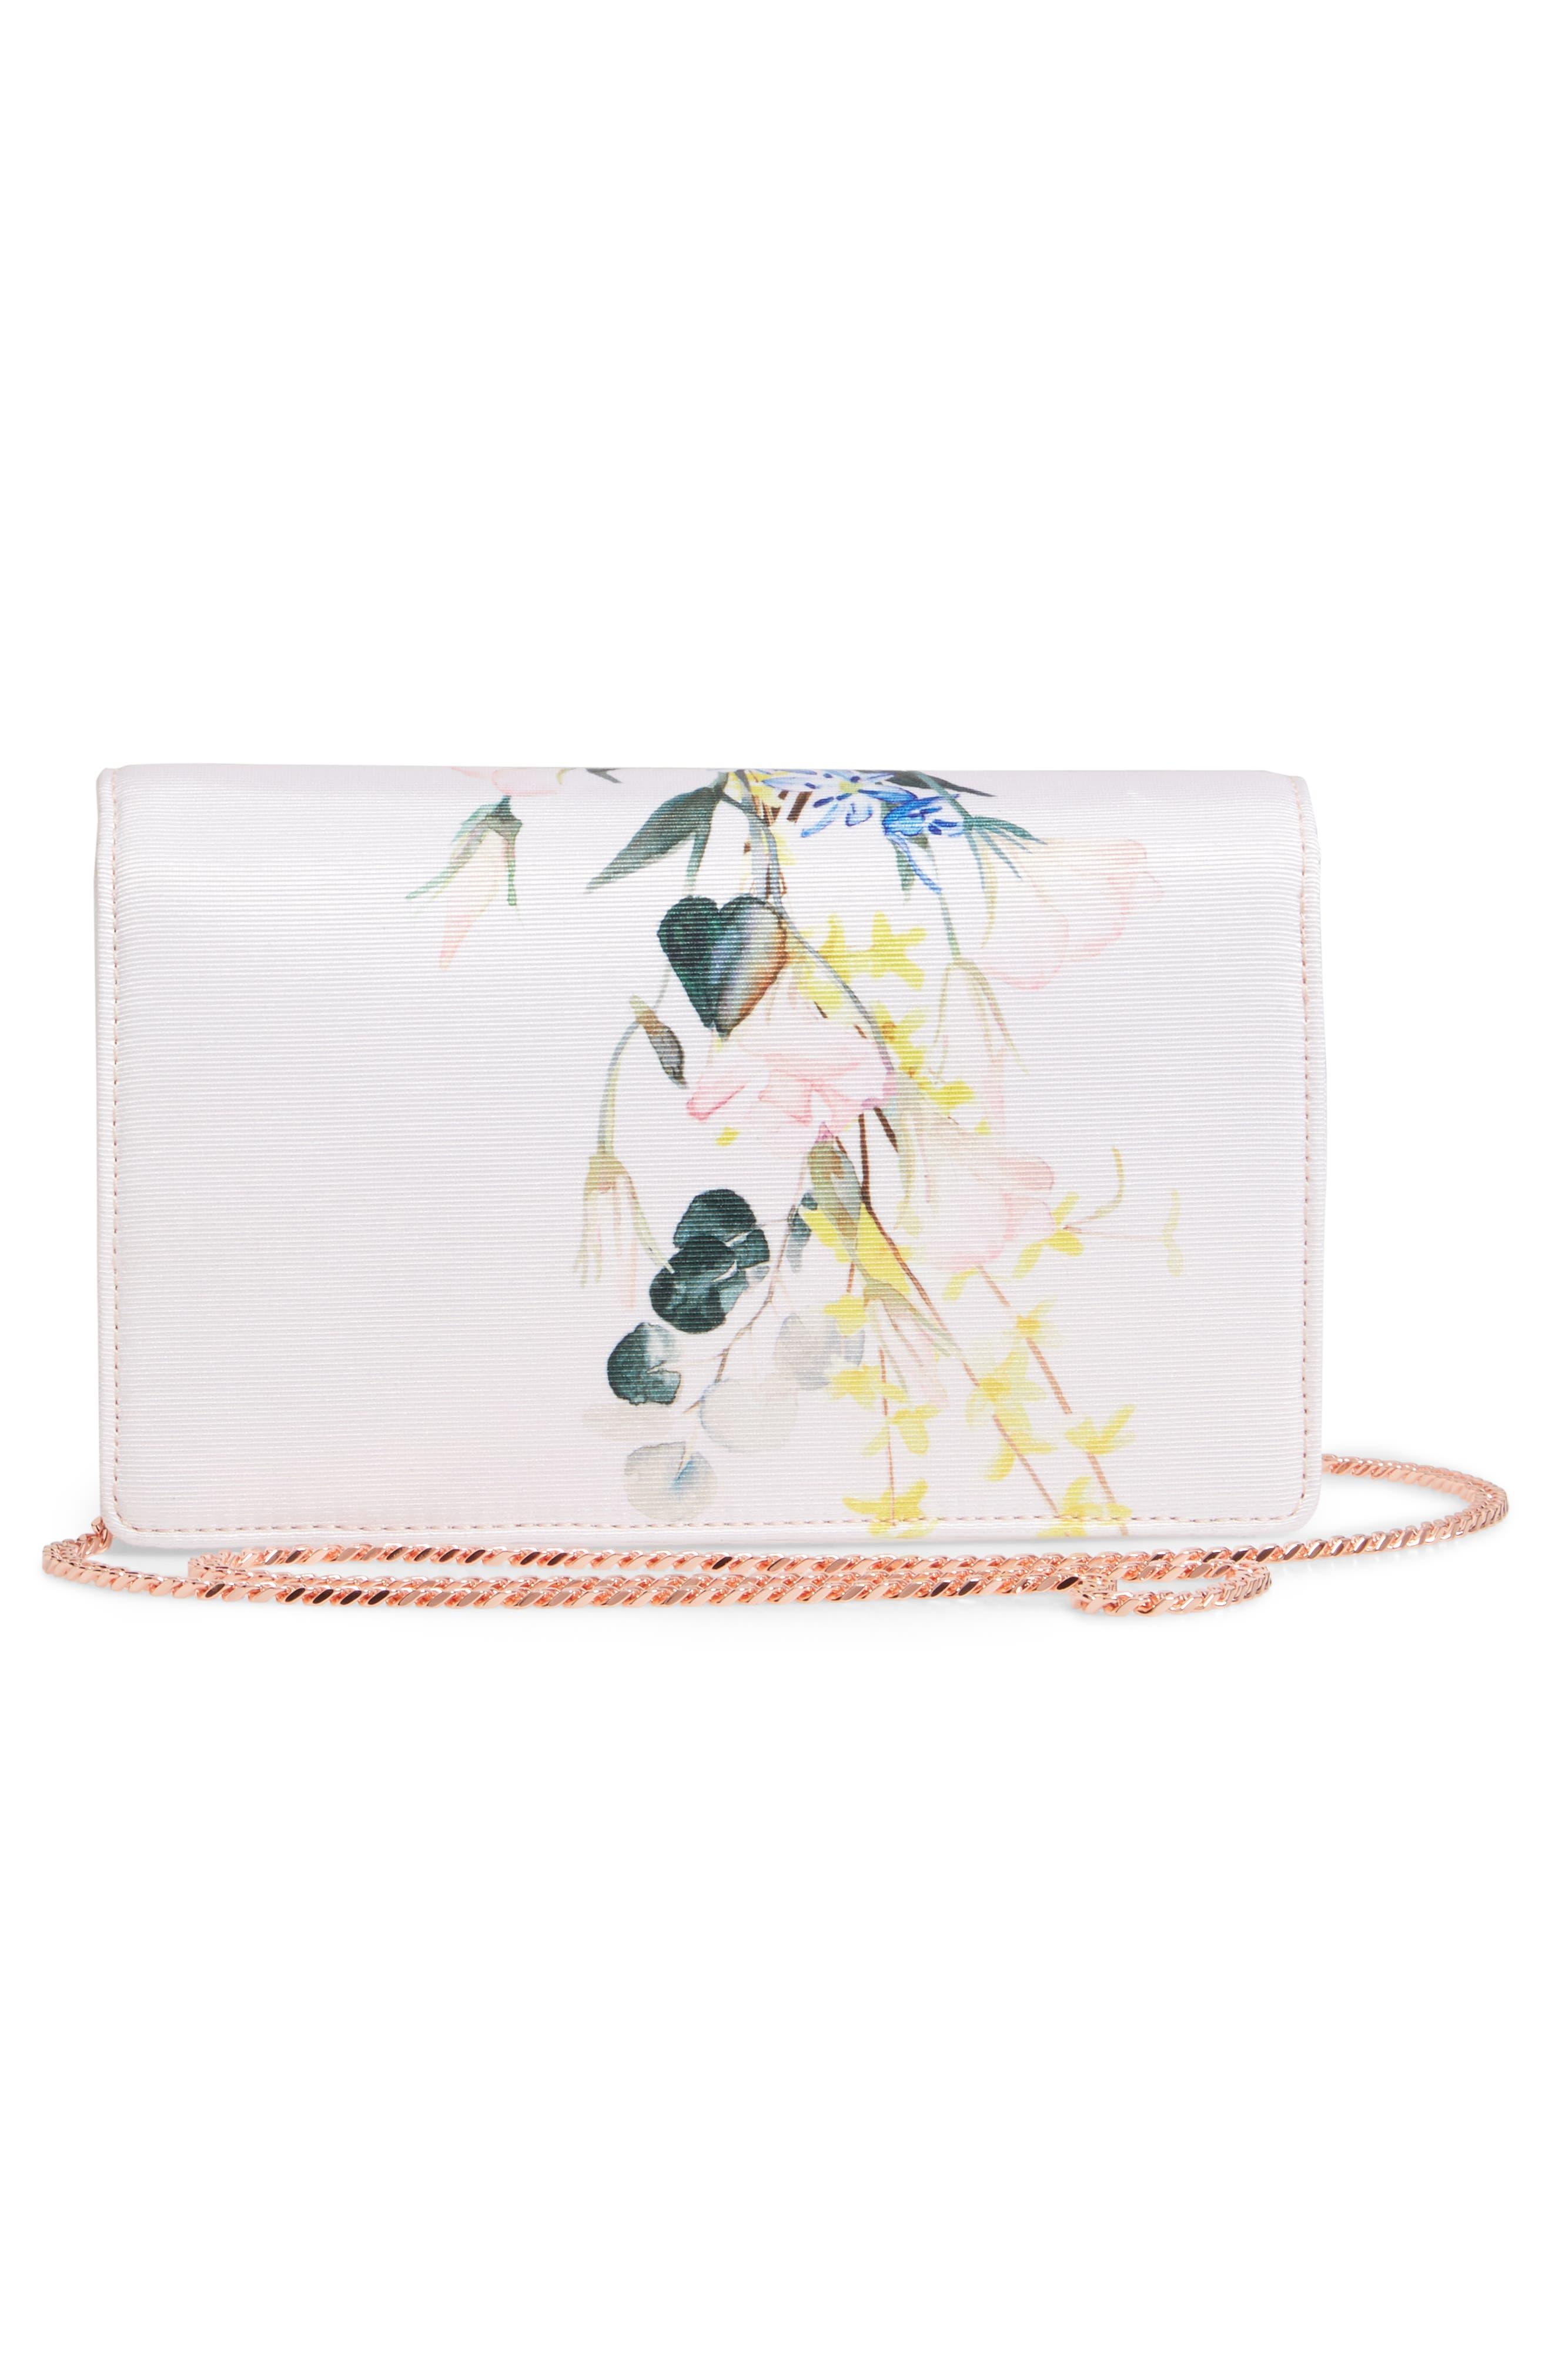 Hania Elegant Bow Evening Bag,                             Alternate thumbnail 3, color,                             NUDE PINK